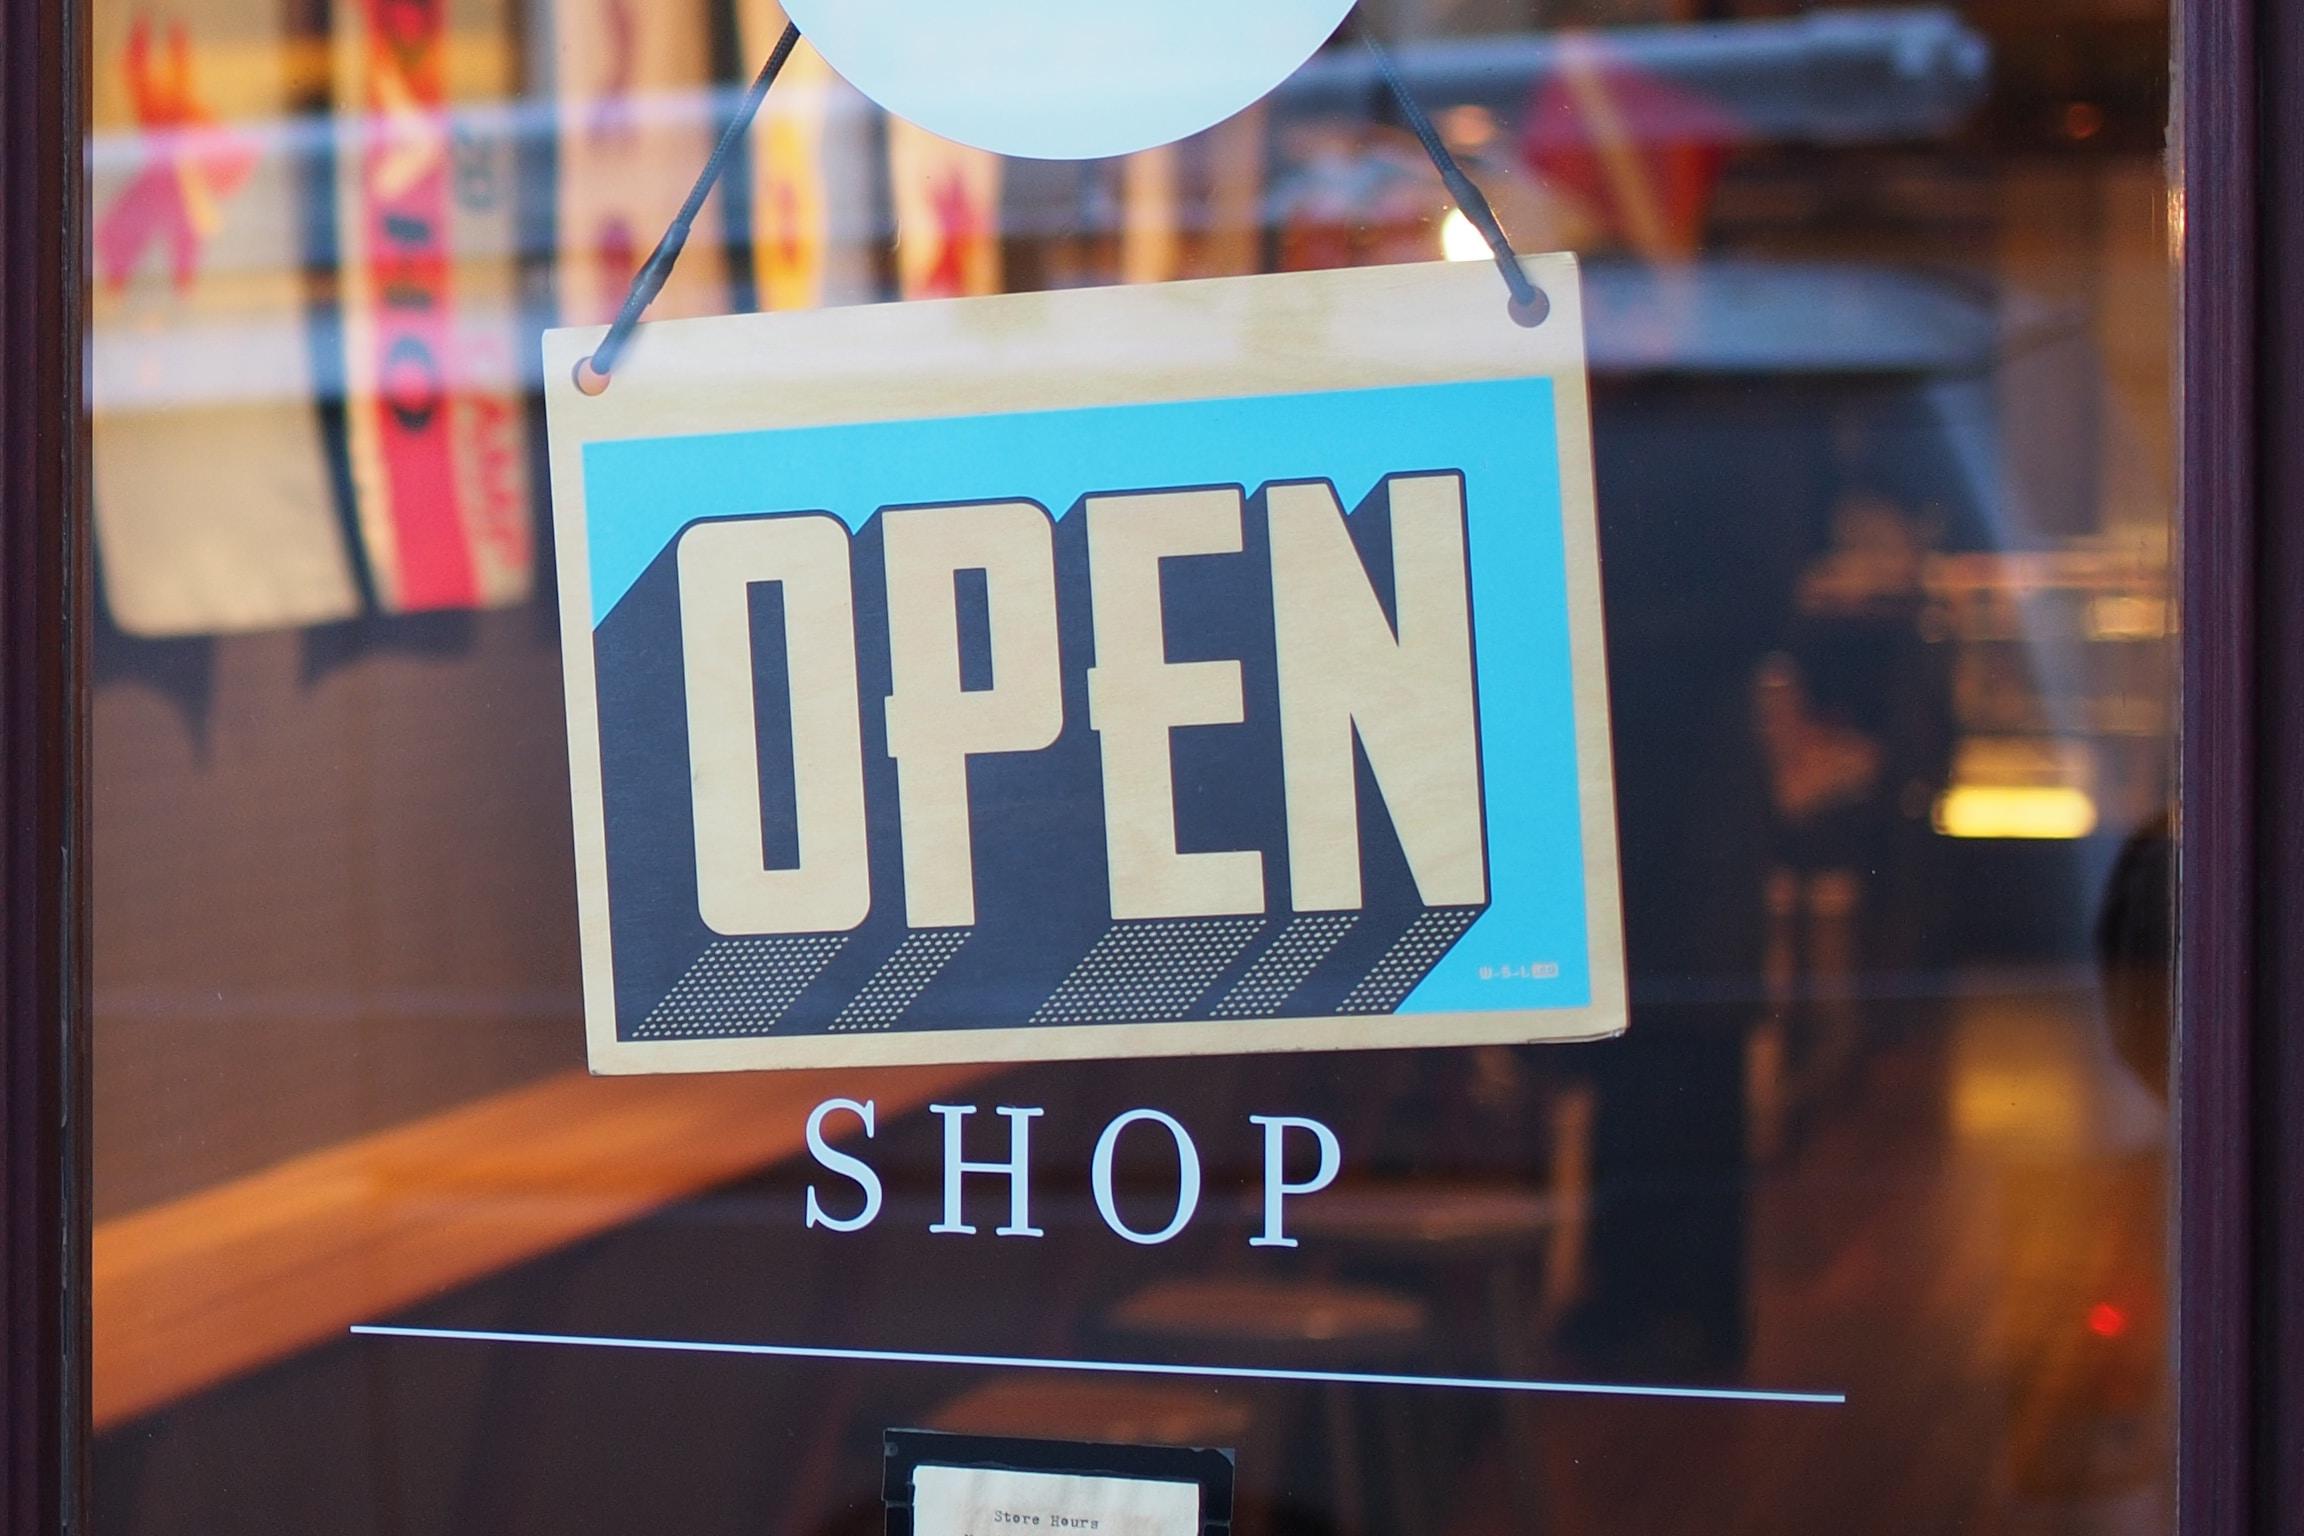 An open sign in a shop window